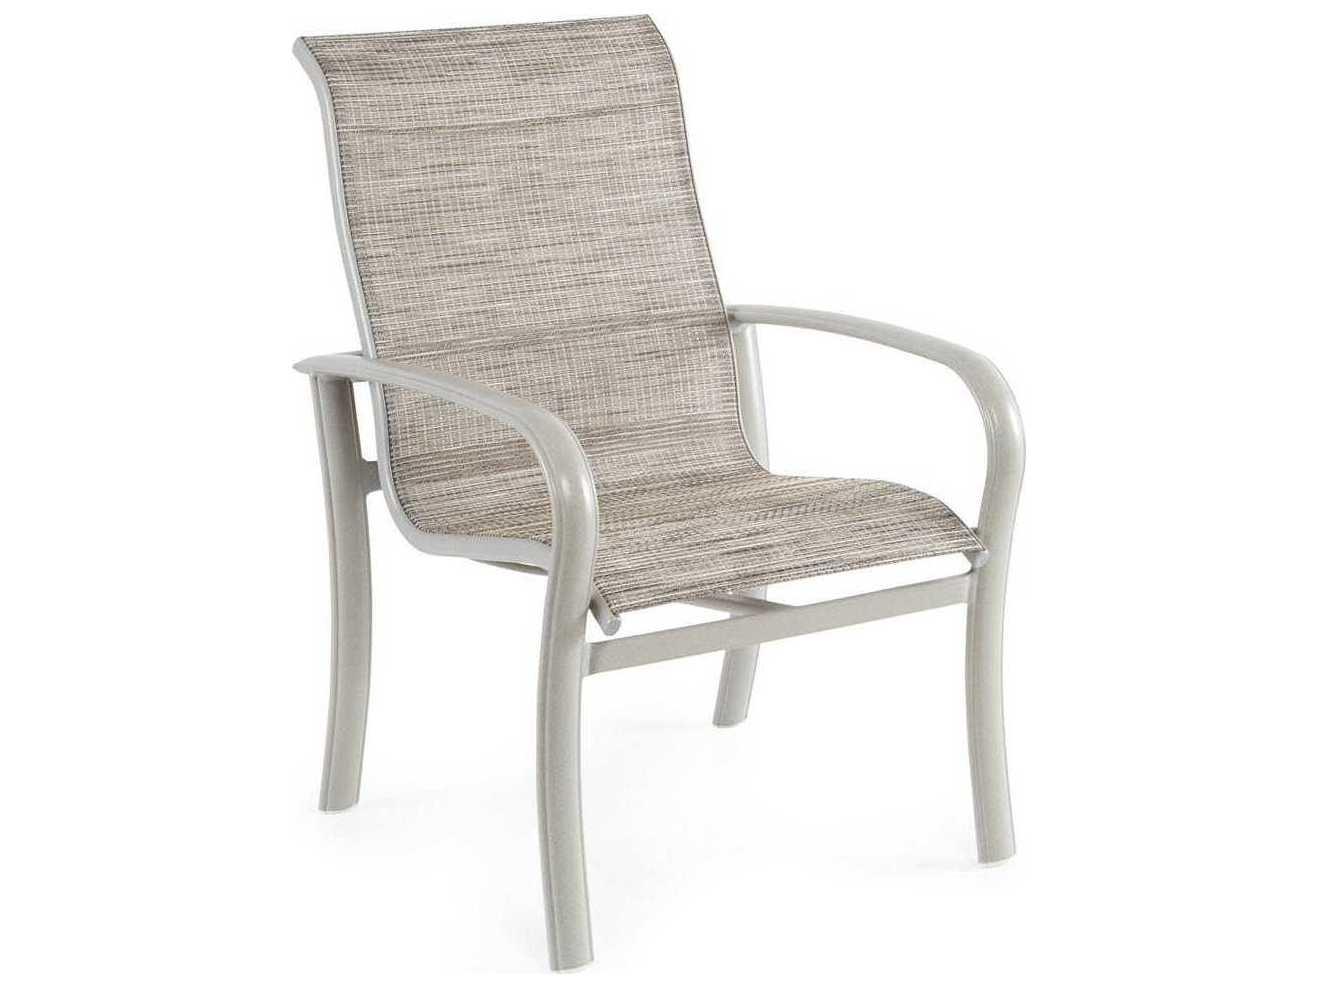 Winston Savoy Sling Aluminum High Back Arm Dining Chair ...